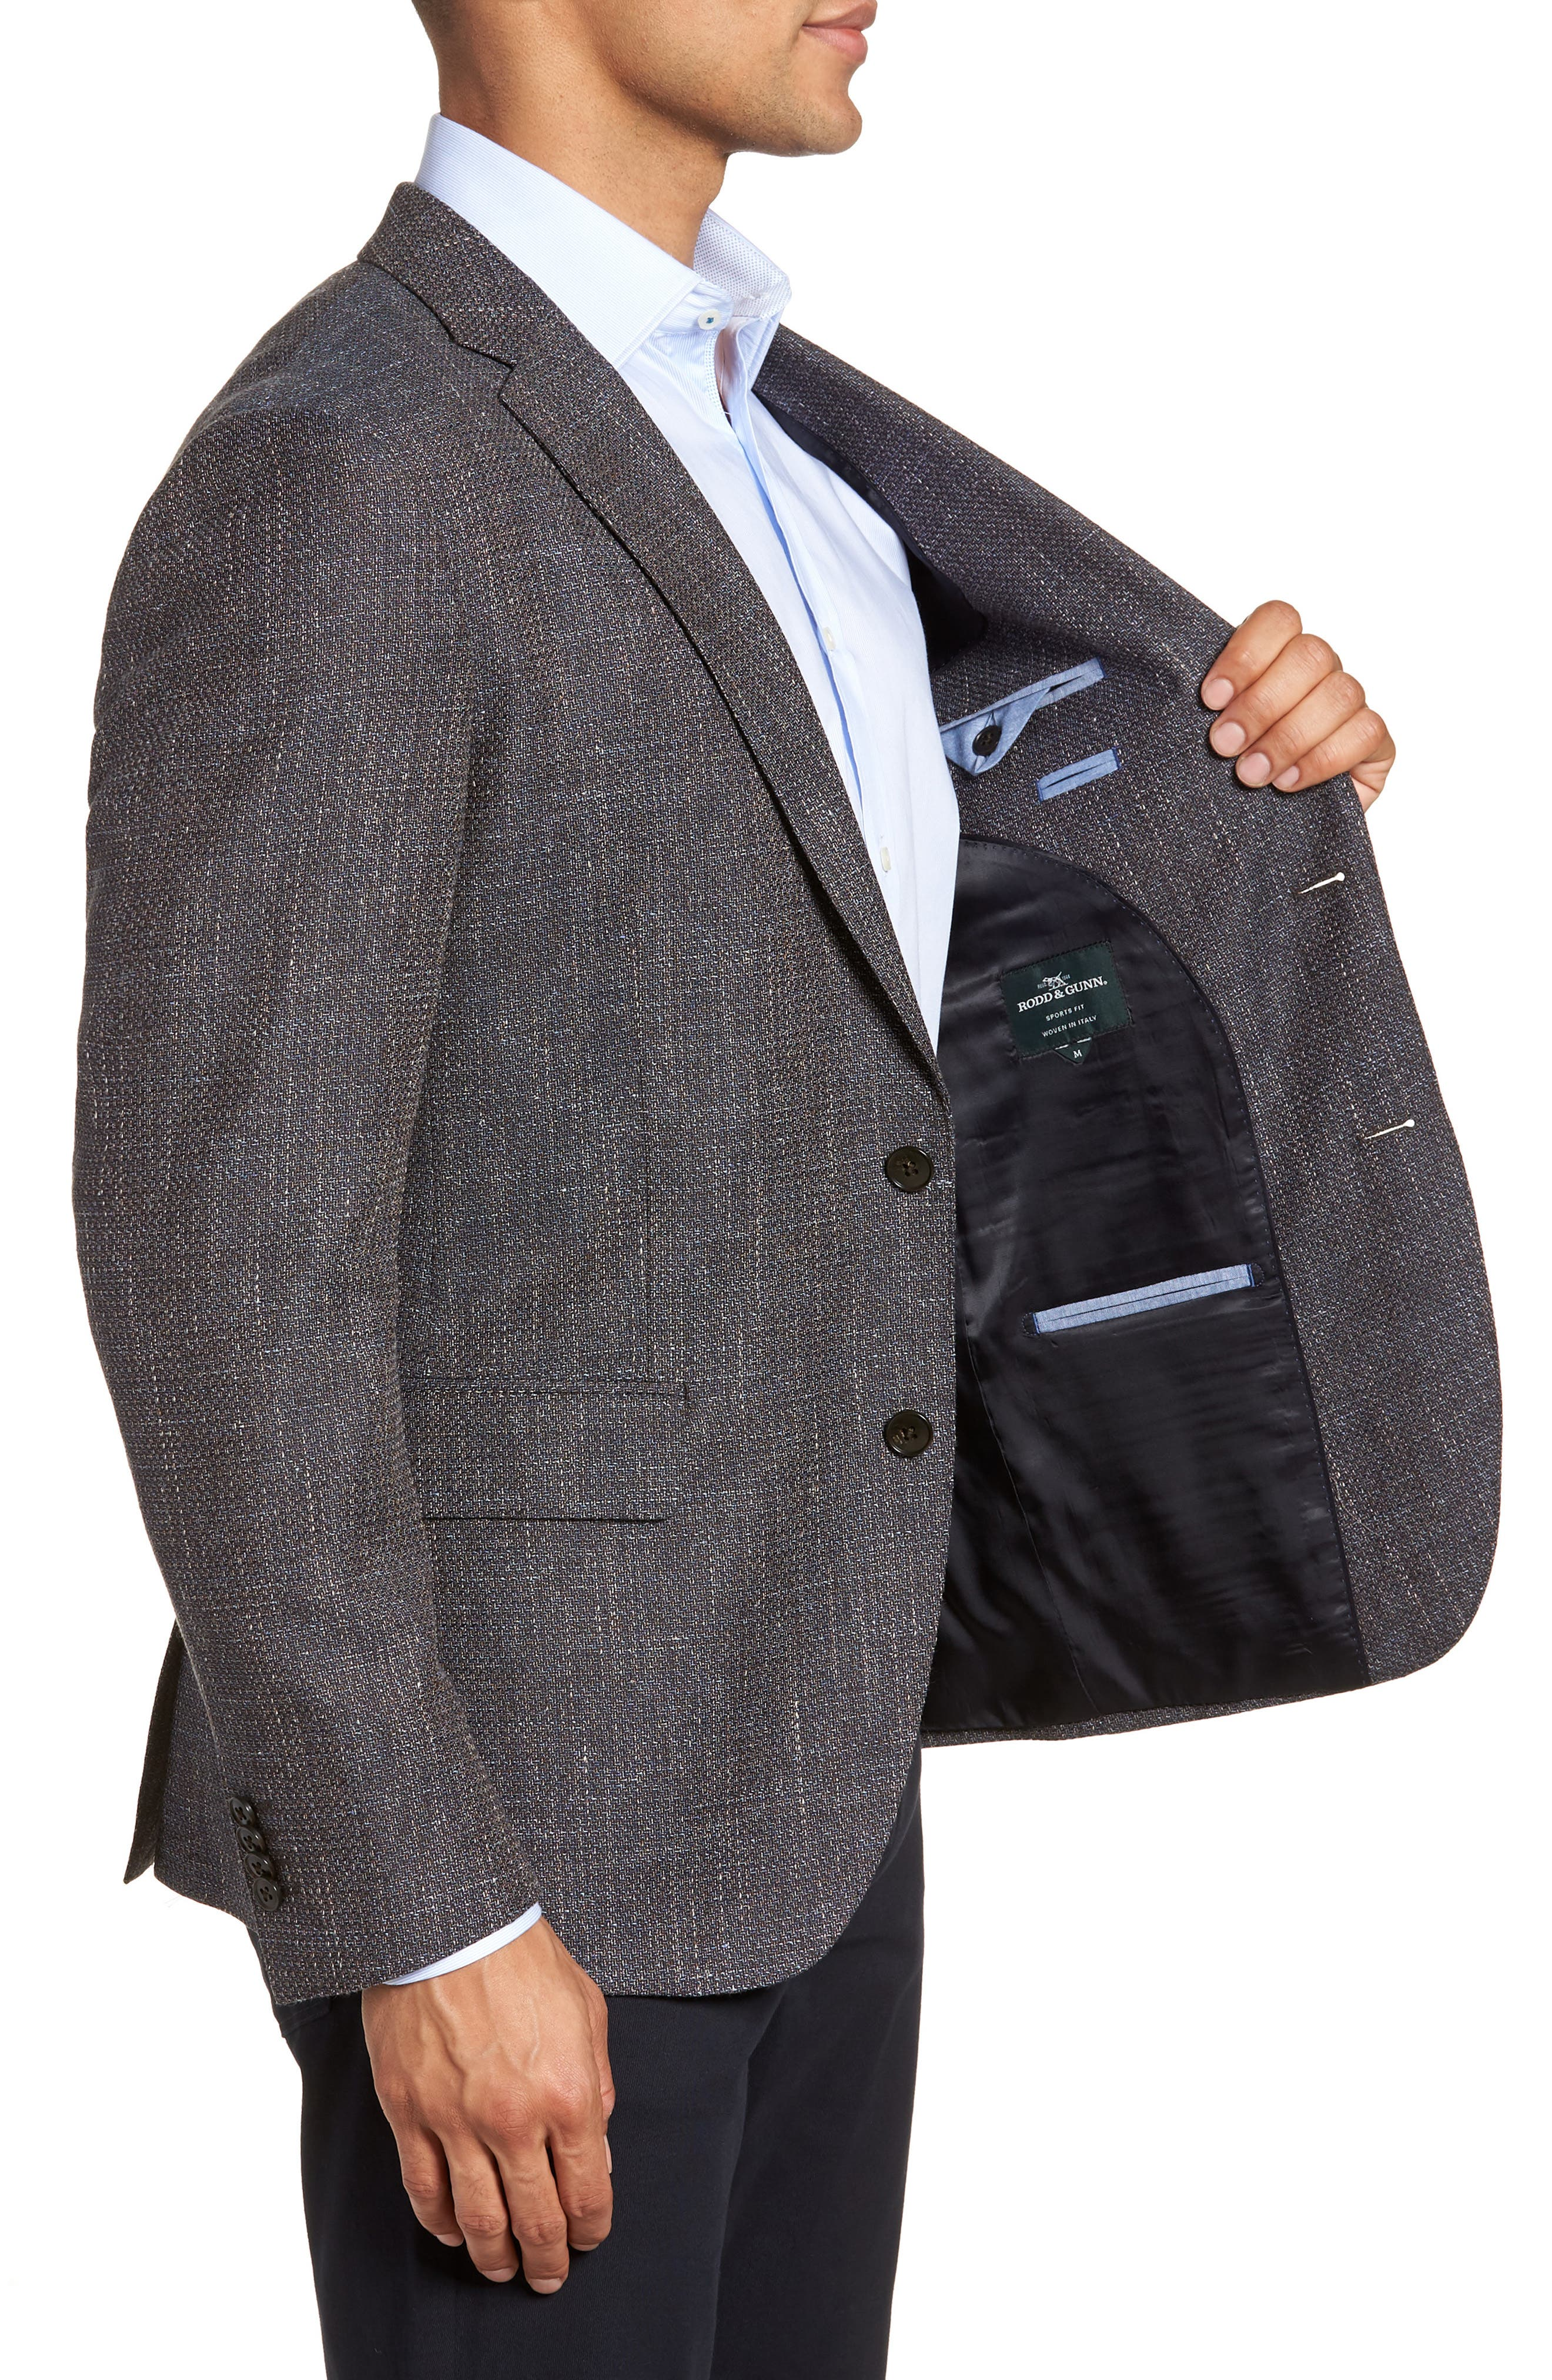 Five Bridges Slim Fit Tweed Sport Coat,                             Alternate thumbnail 3, color,                             Sepia